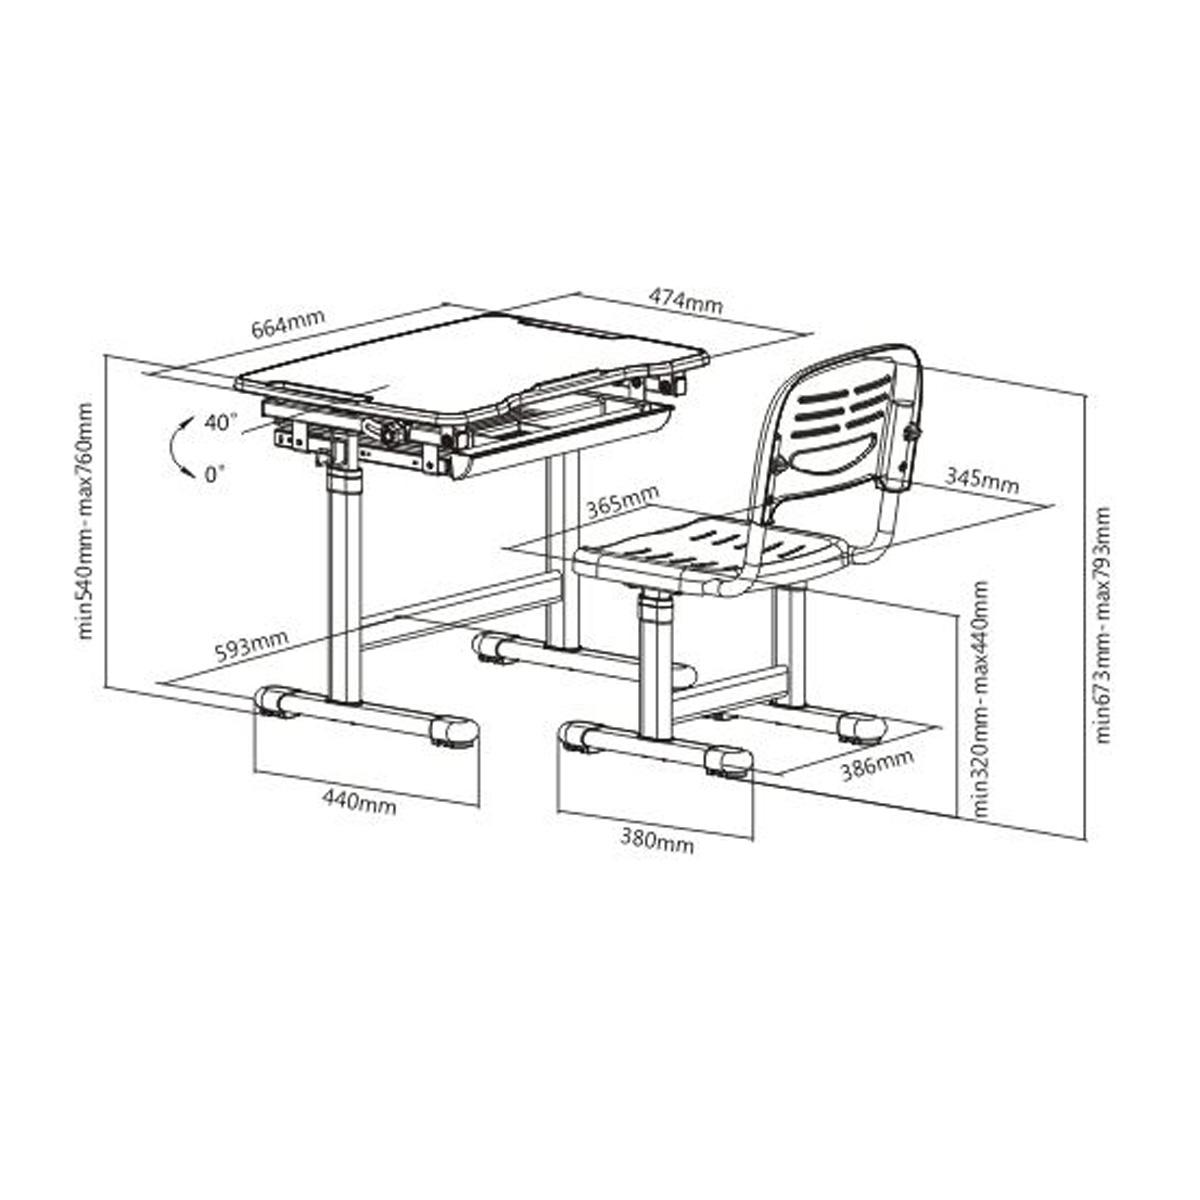 Boost Industries Kidzdesk Kd26b Ergonomic Height Adjustable Children Desk And Chair Set Blue